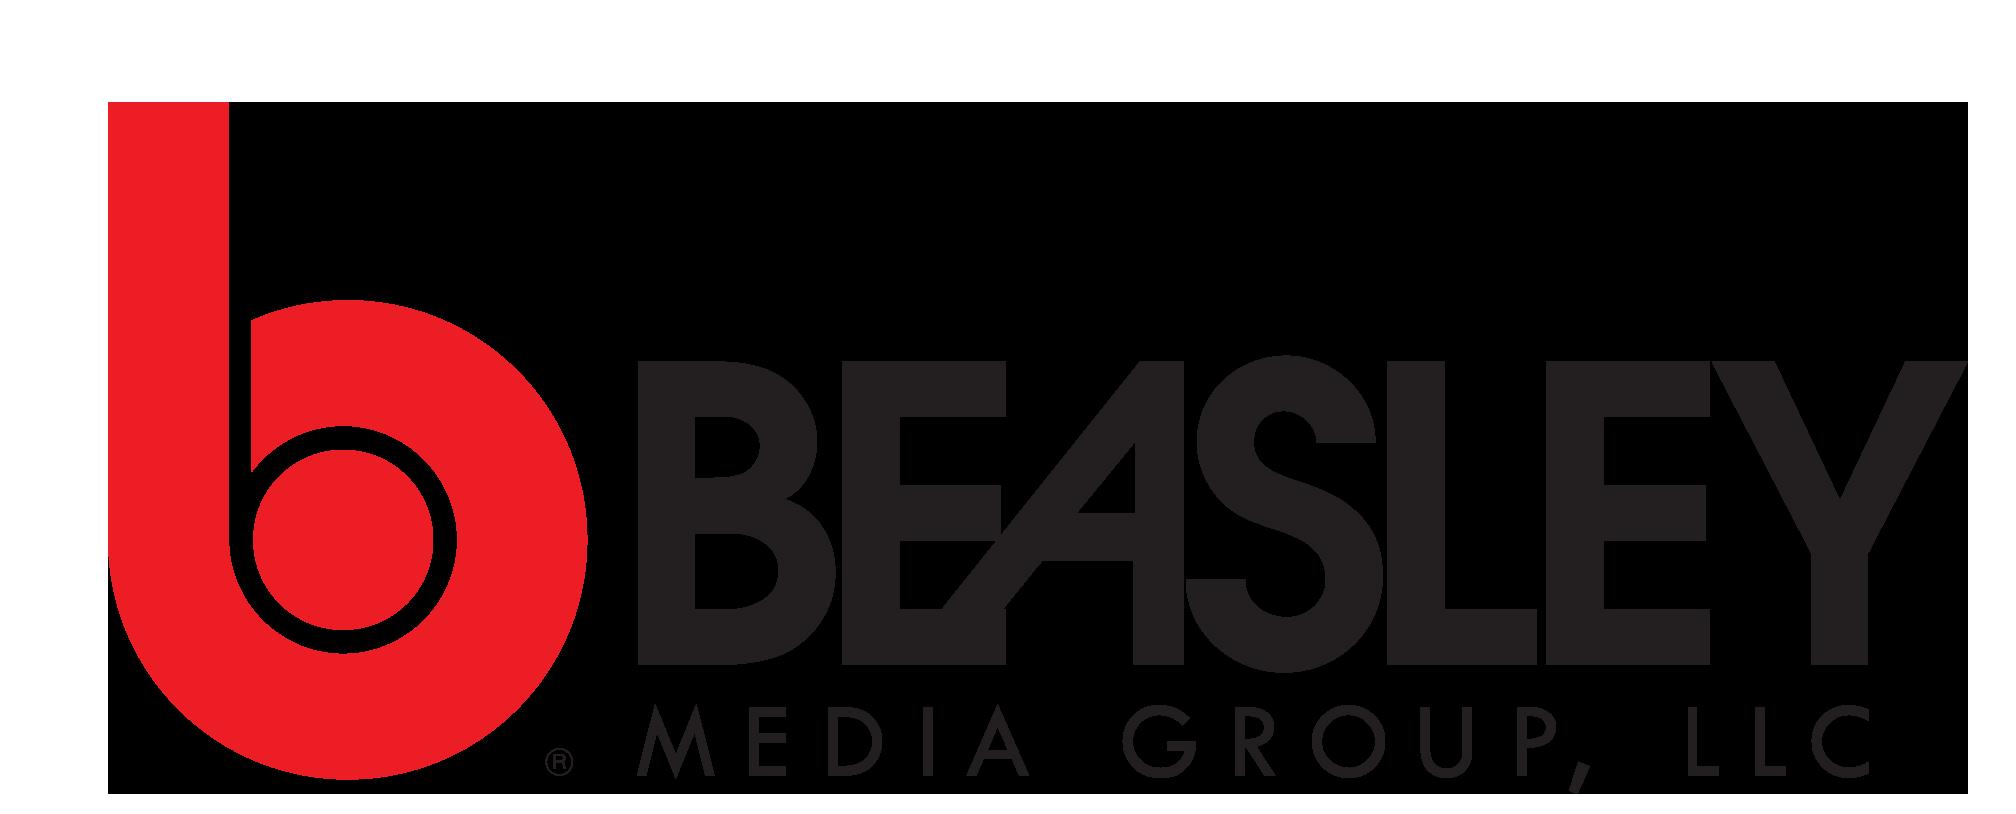 Beasley Media Group LLC_Logo.